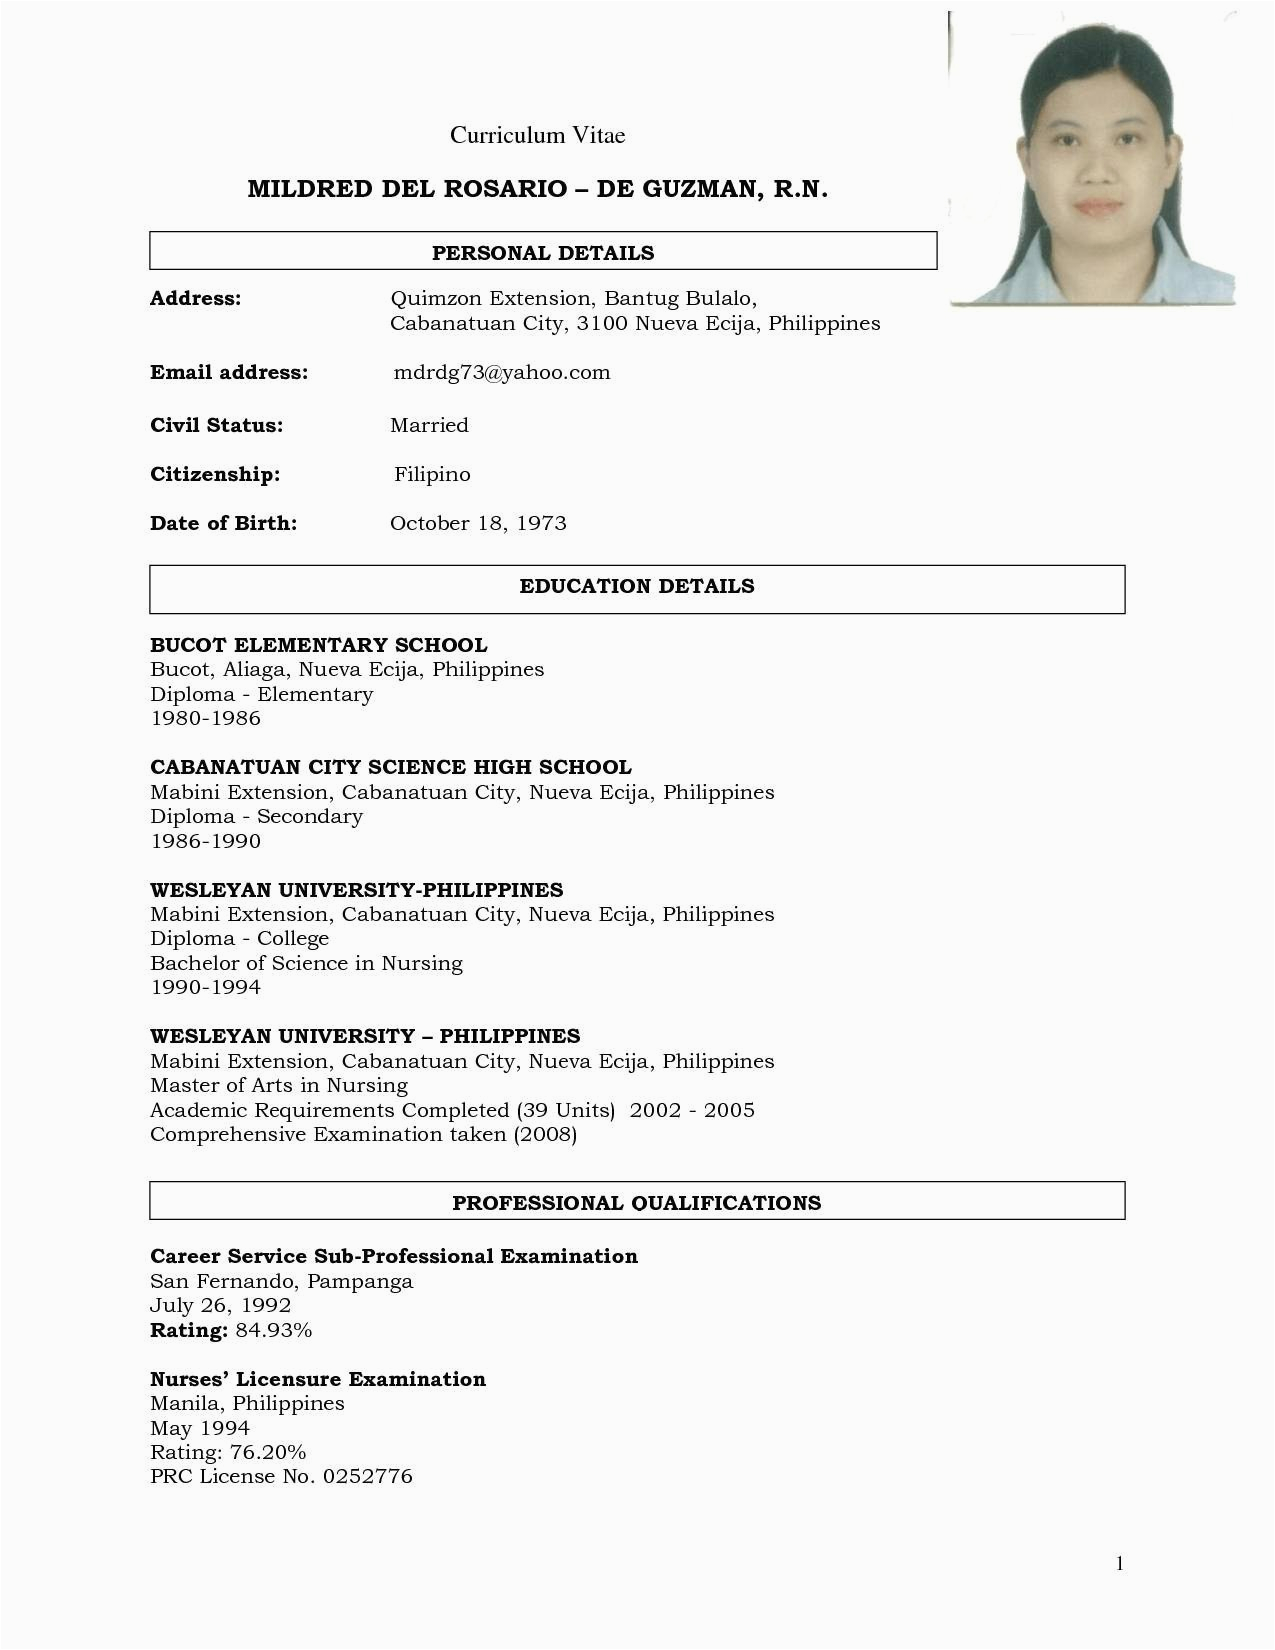 Resume Sample Philippines High School Graduate 8 9 Resumes for High School Graduates Aikenexplorer